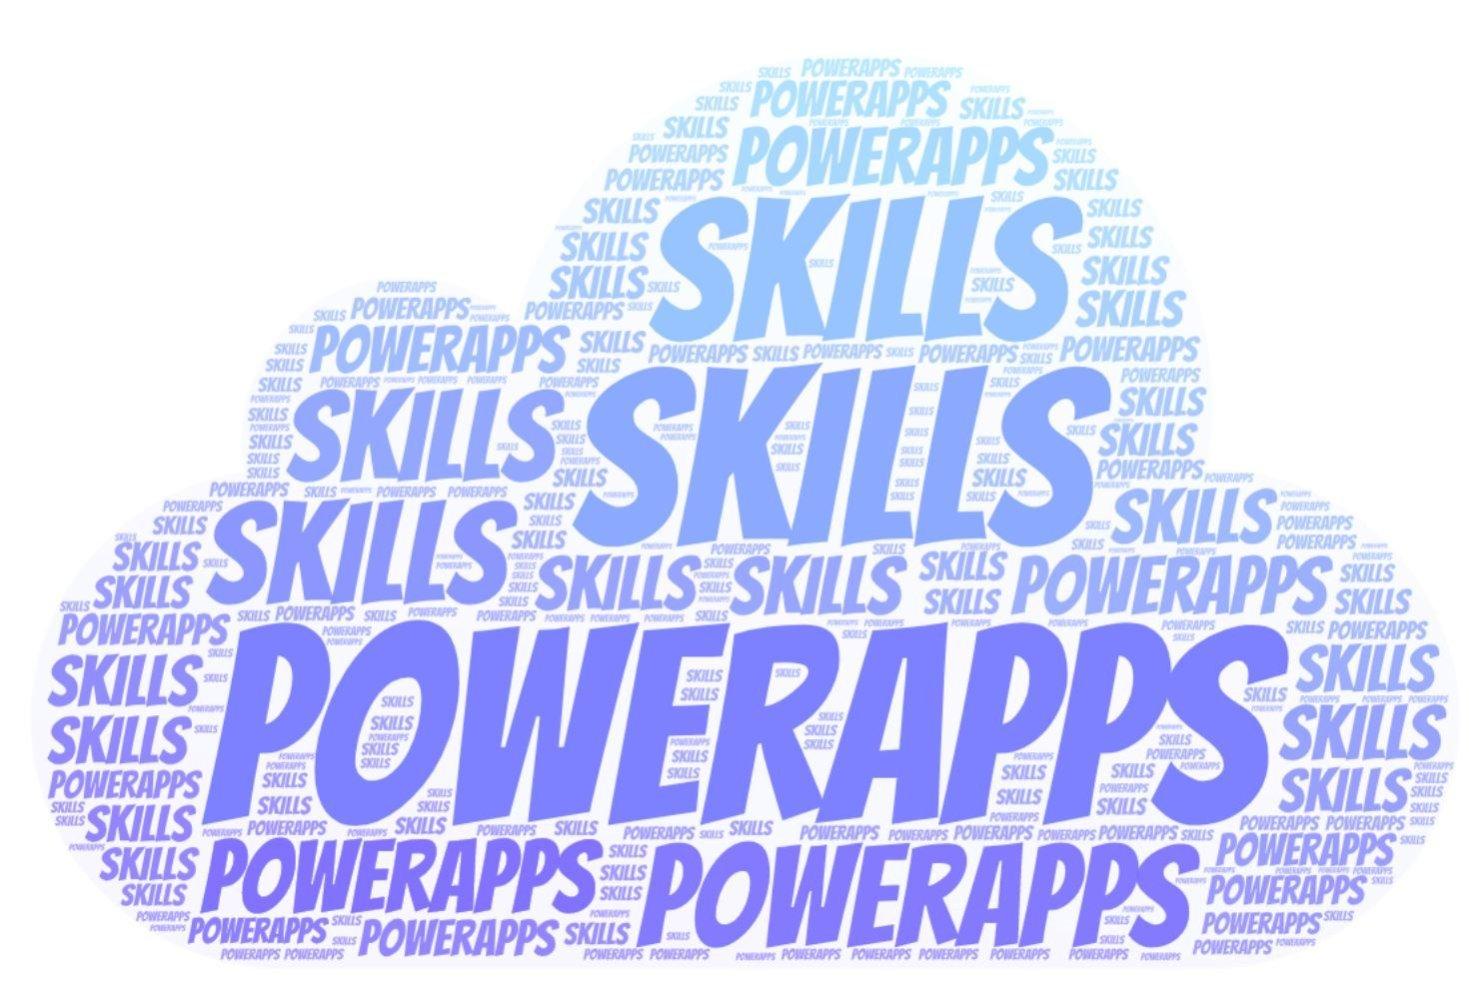 Skills for the PowerApps developer